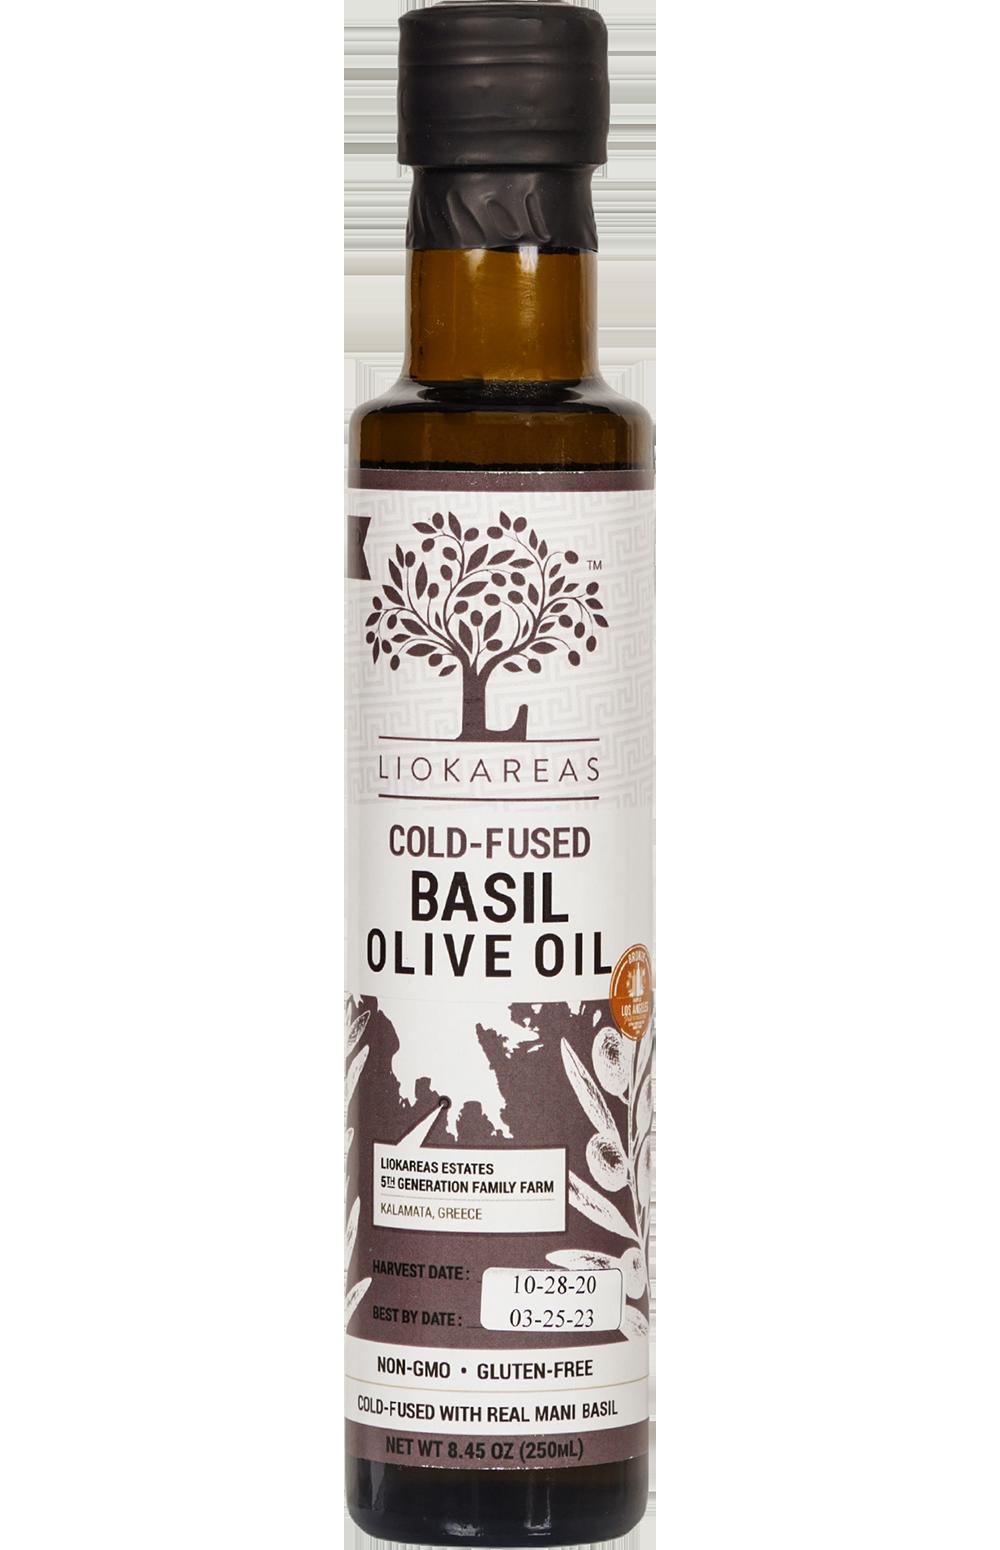 Liokareas Cold Fused Basil